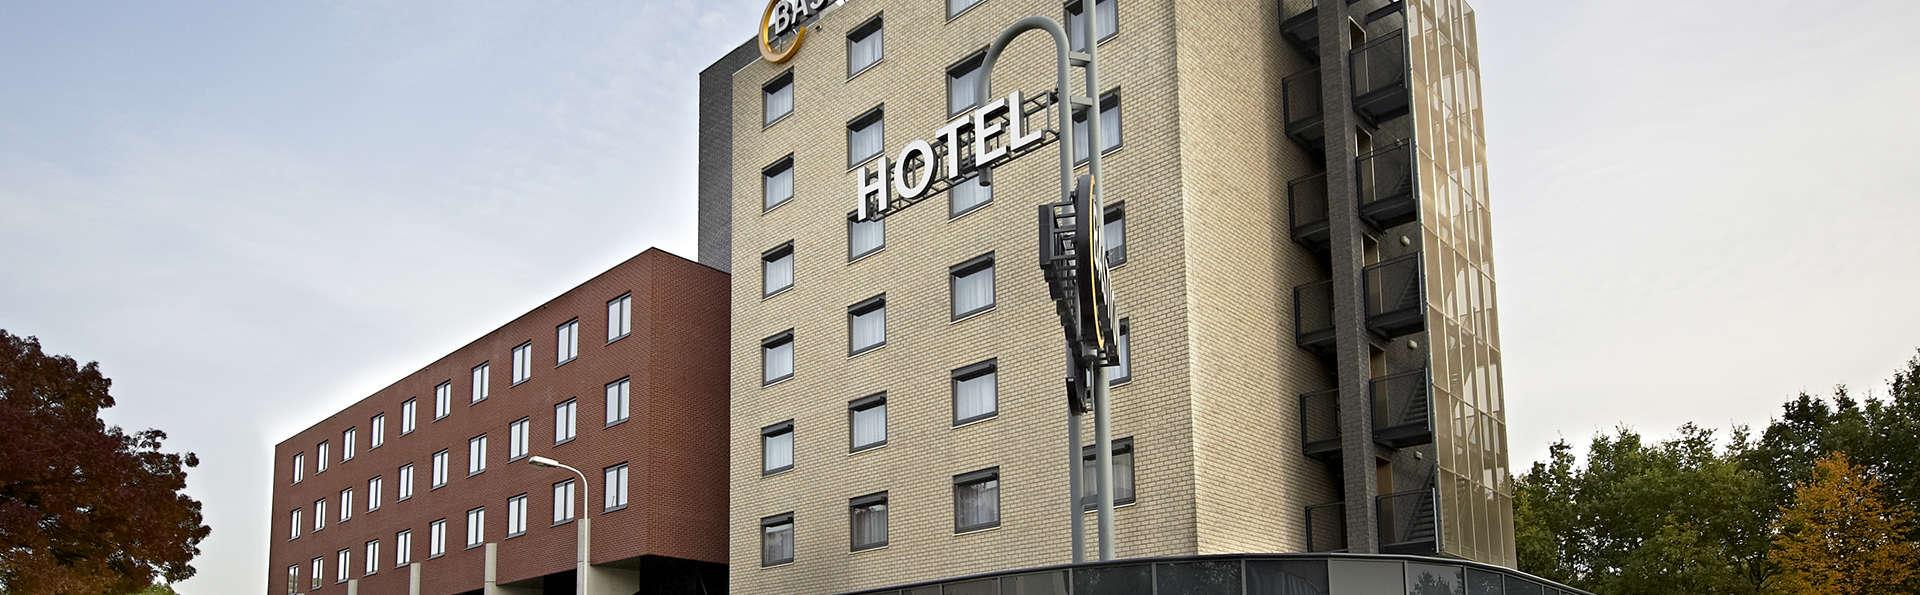 Bastion Hotel Den Haag Rijswijk - EDIT_FRONT.jpg